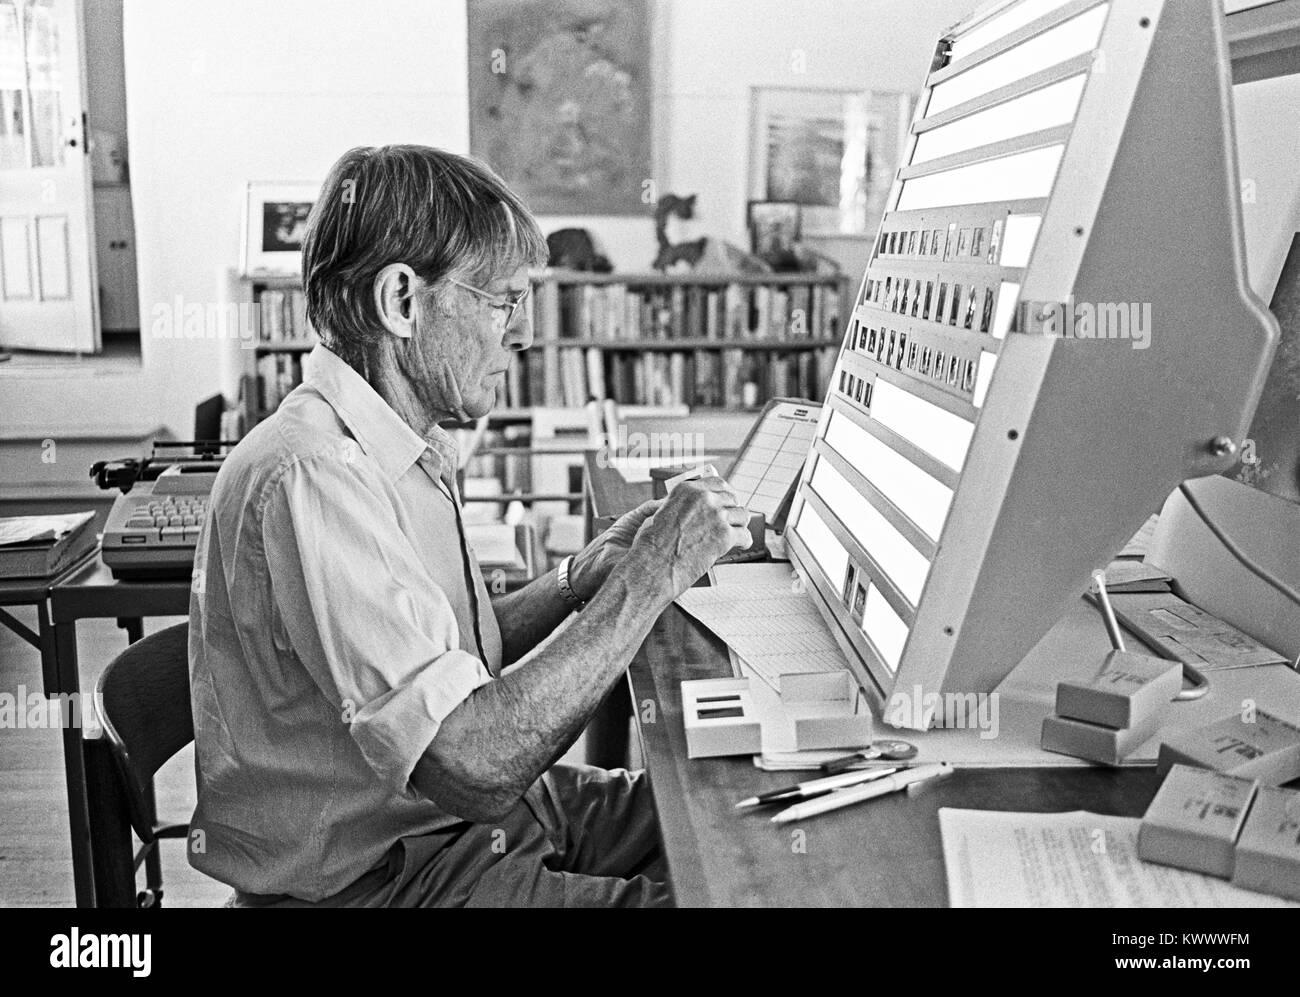 A portrait of American photographer Eliot Porter,1901-1990, in his studio in Tesuque, New Mexico, circa 1979. - Stock Image